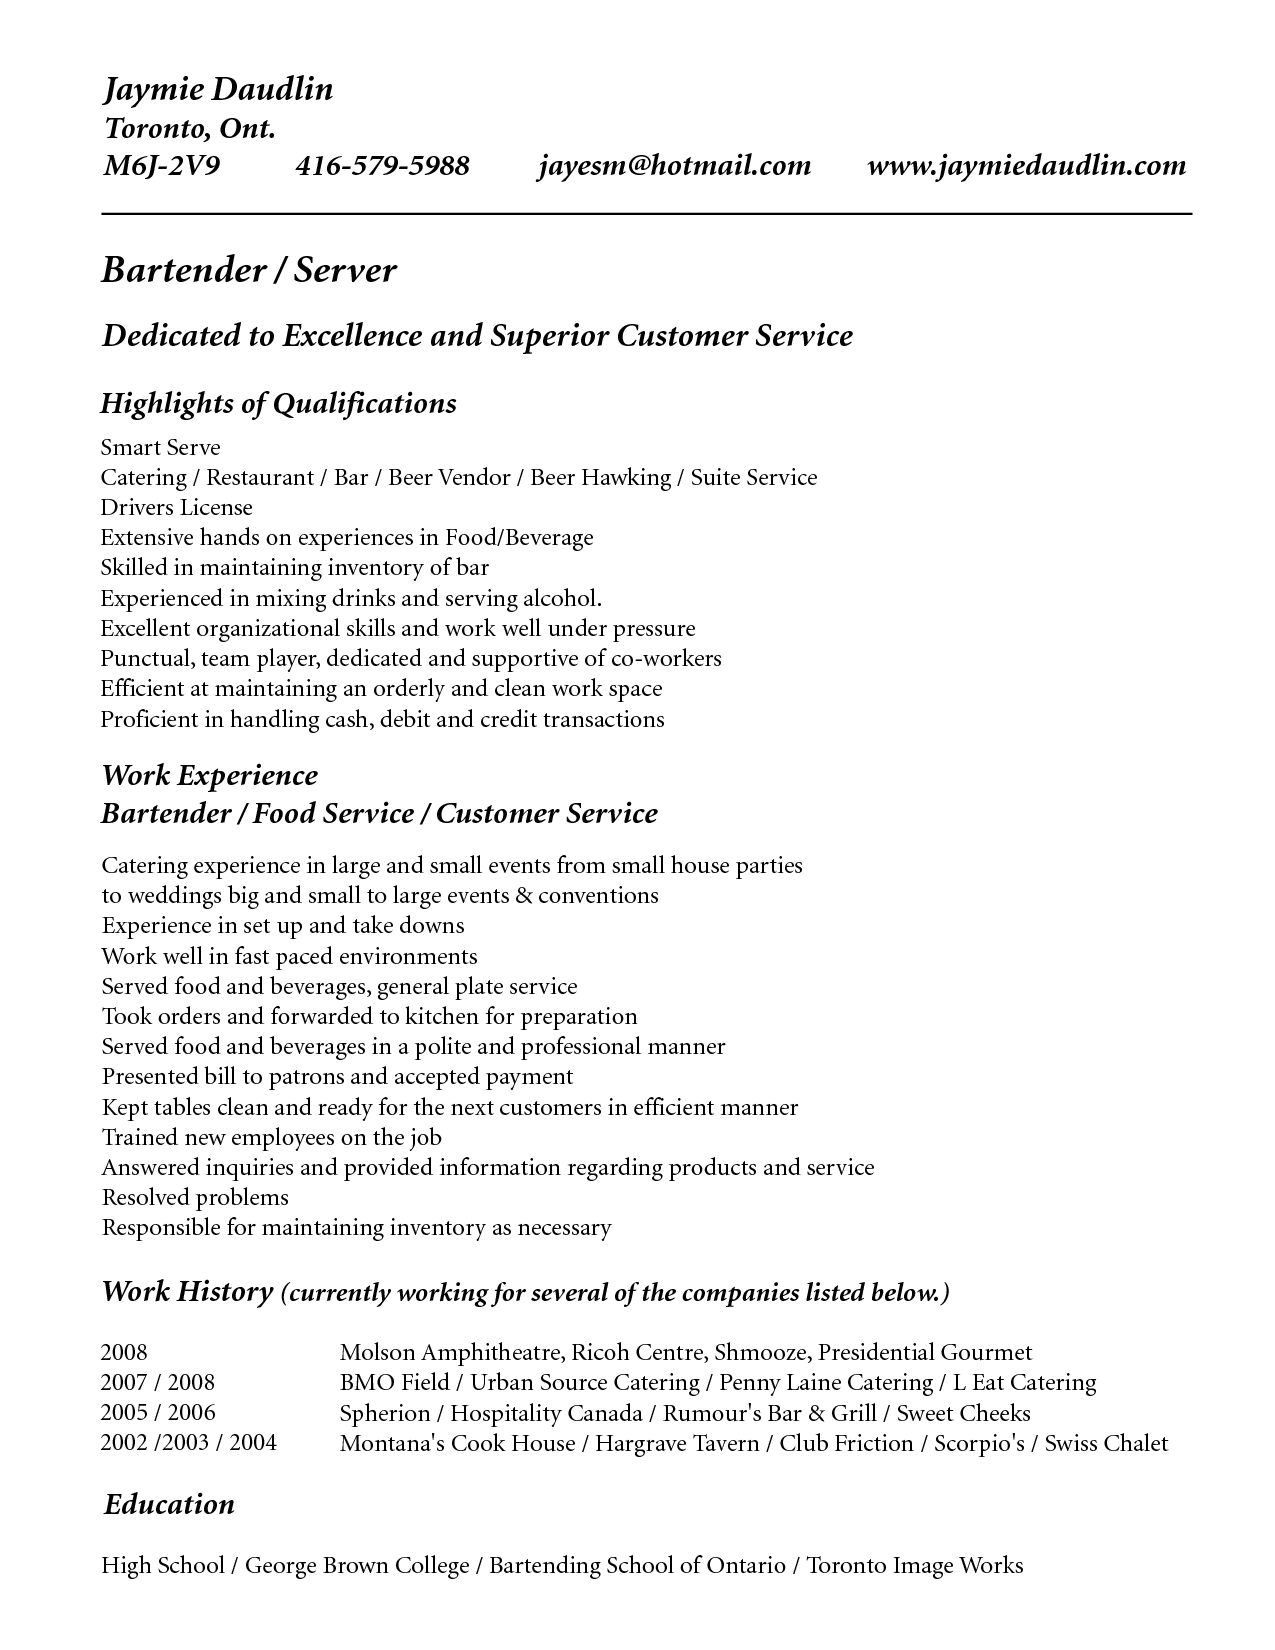 Pin By Jobresume On Resume Career Termplate Free Sample